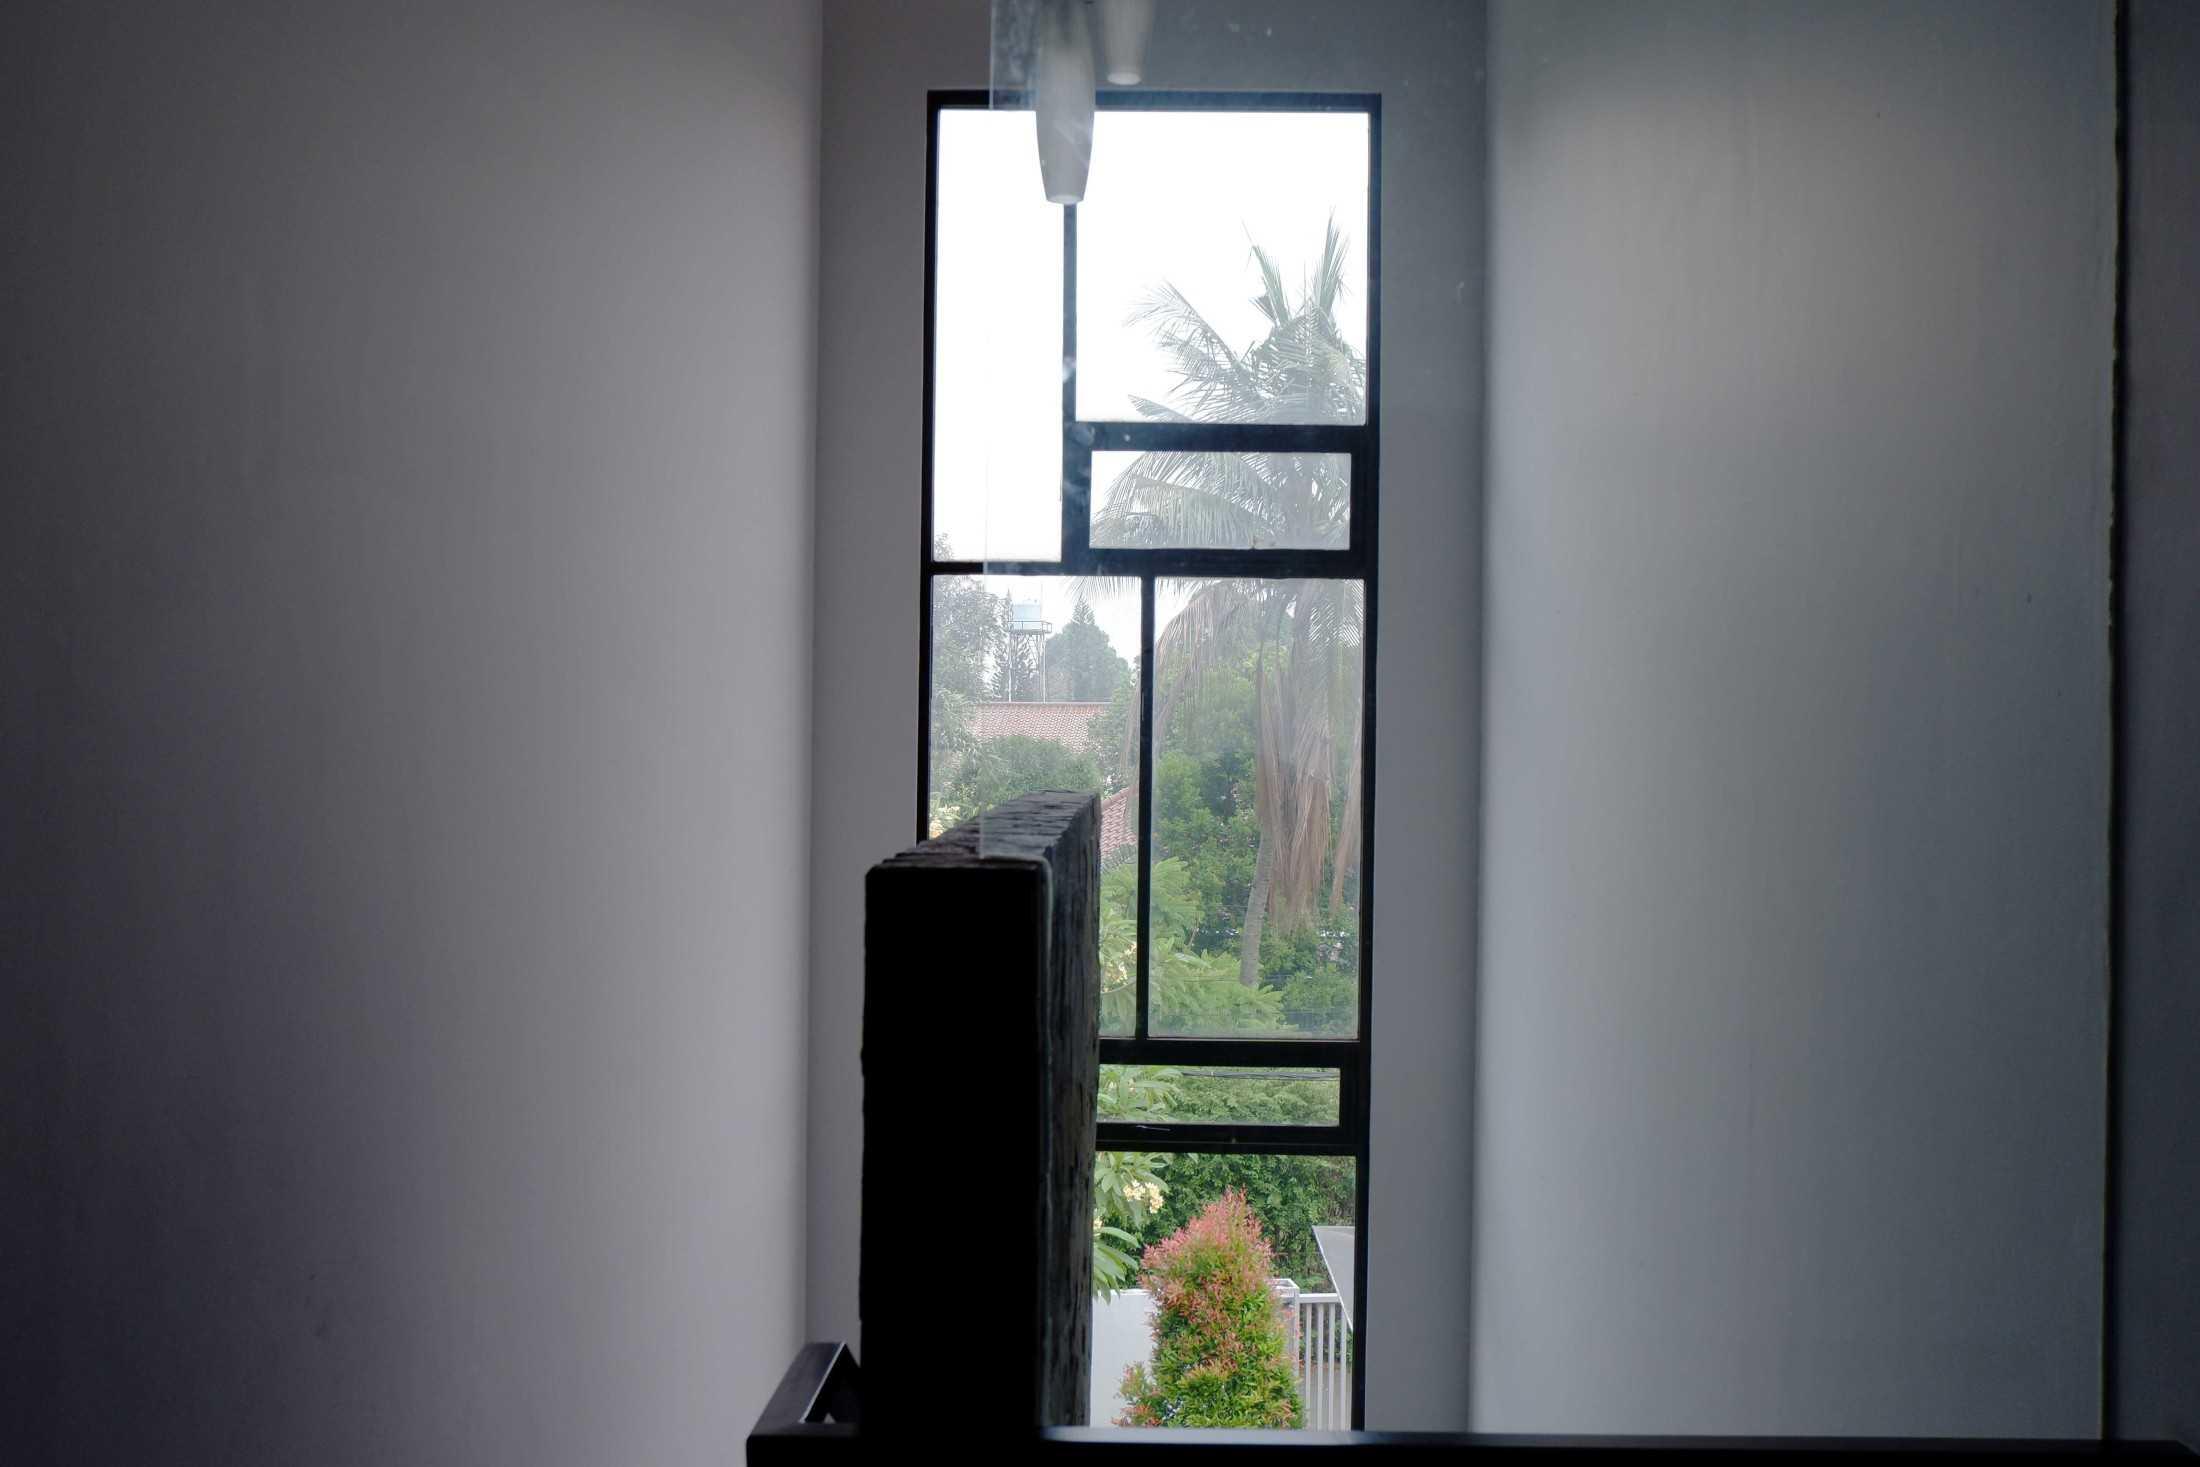 Lokative Studio Renovasi Rumah Cempaka Jakarta, Daerah Khusus Ibukota Jakarta, Indonesia Jakarta, Daerah Khusus Ibukota Jakarta, Indonesia Lokative-Studio-Renovasi-Rumah-Cempaka  97465